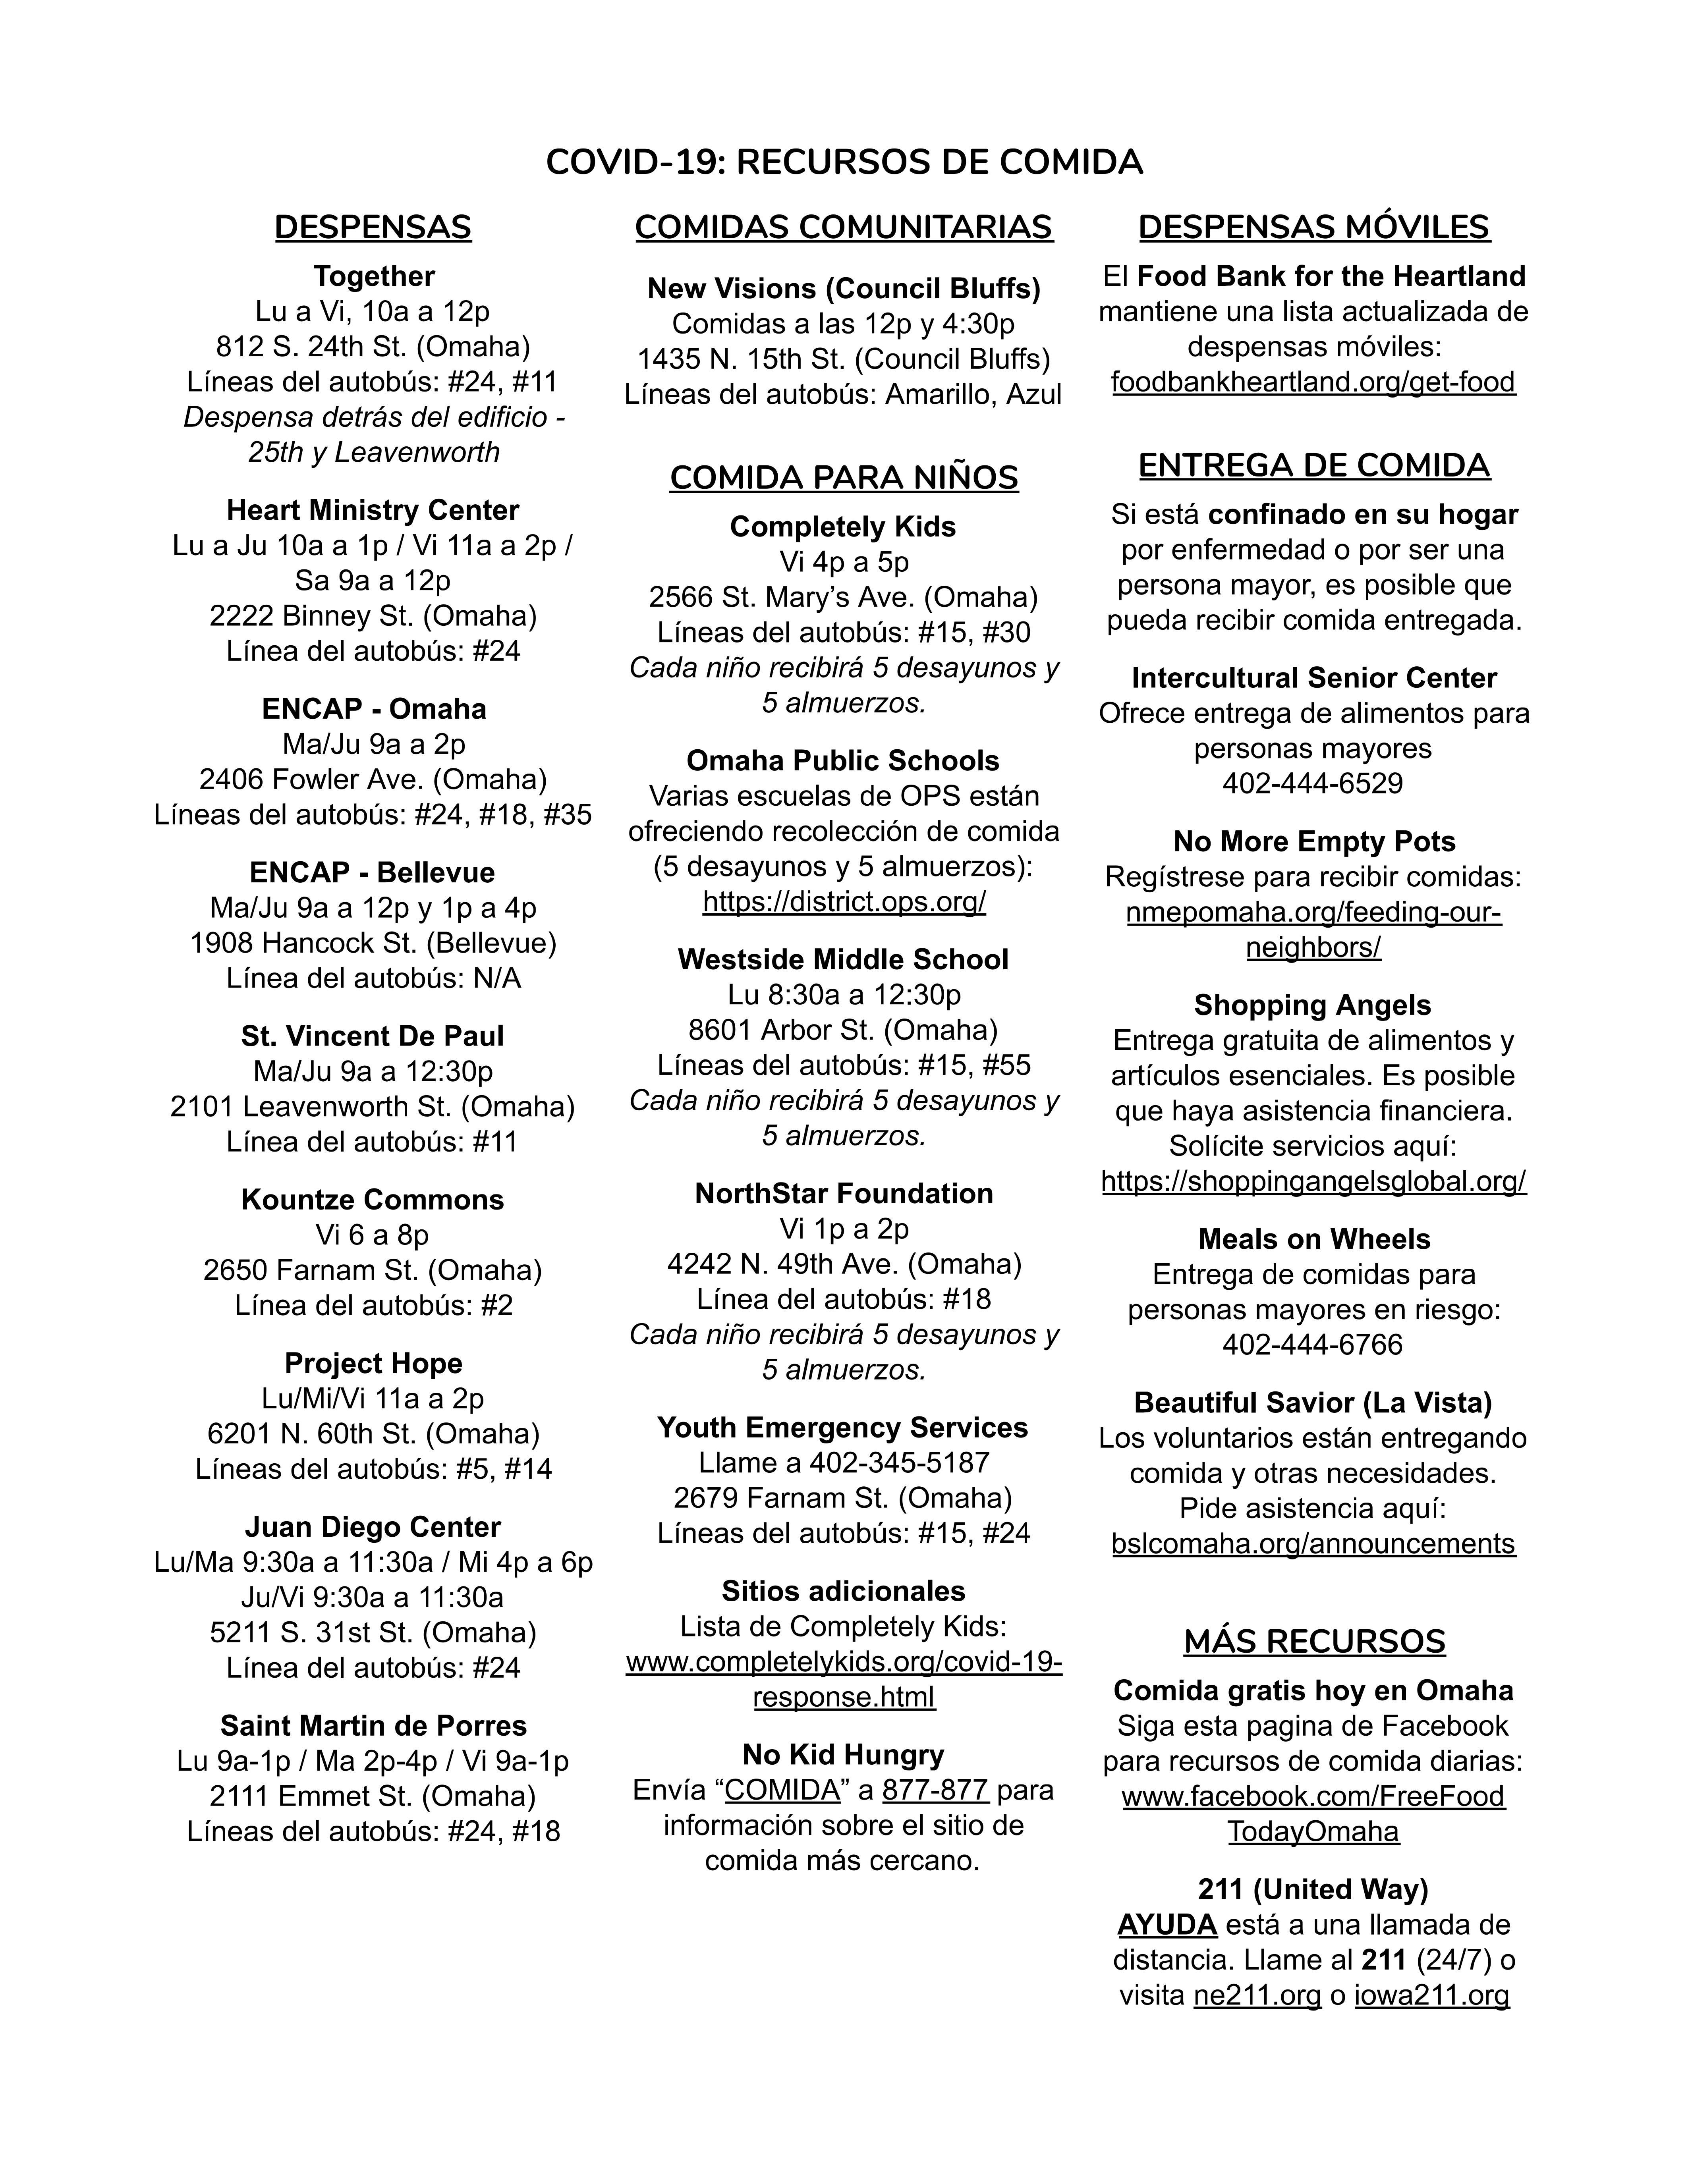 COVID-19 Resource Guide 3 (Spanish)